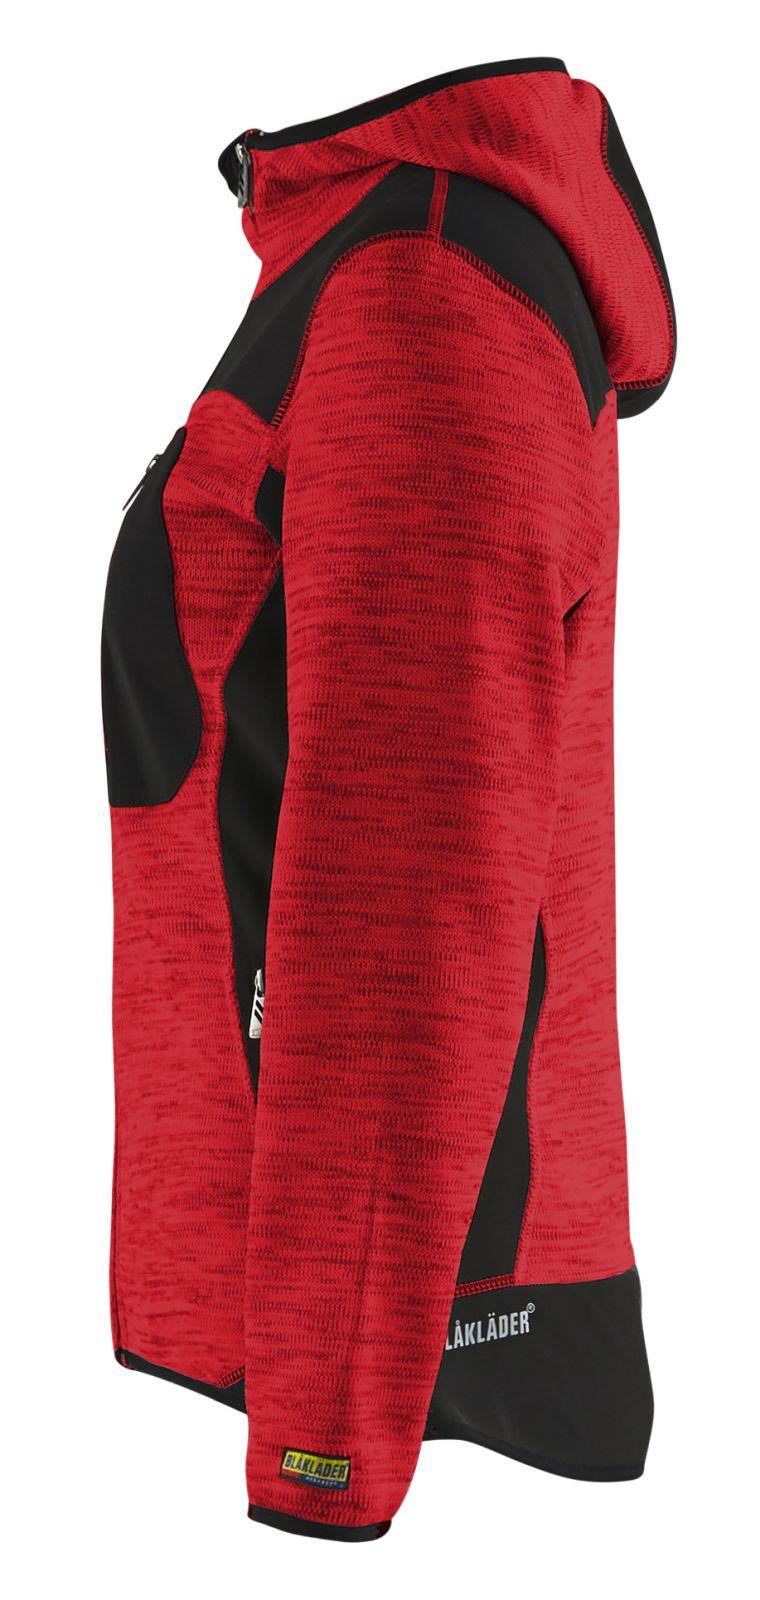 Blaklader Gebreide damesvesten 49312117 rood-zwart(5699)